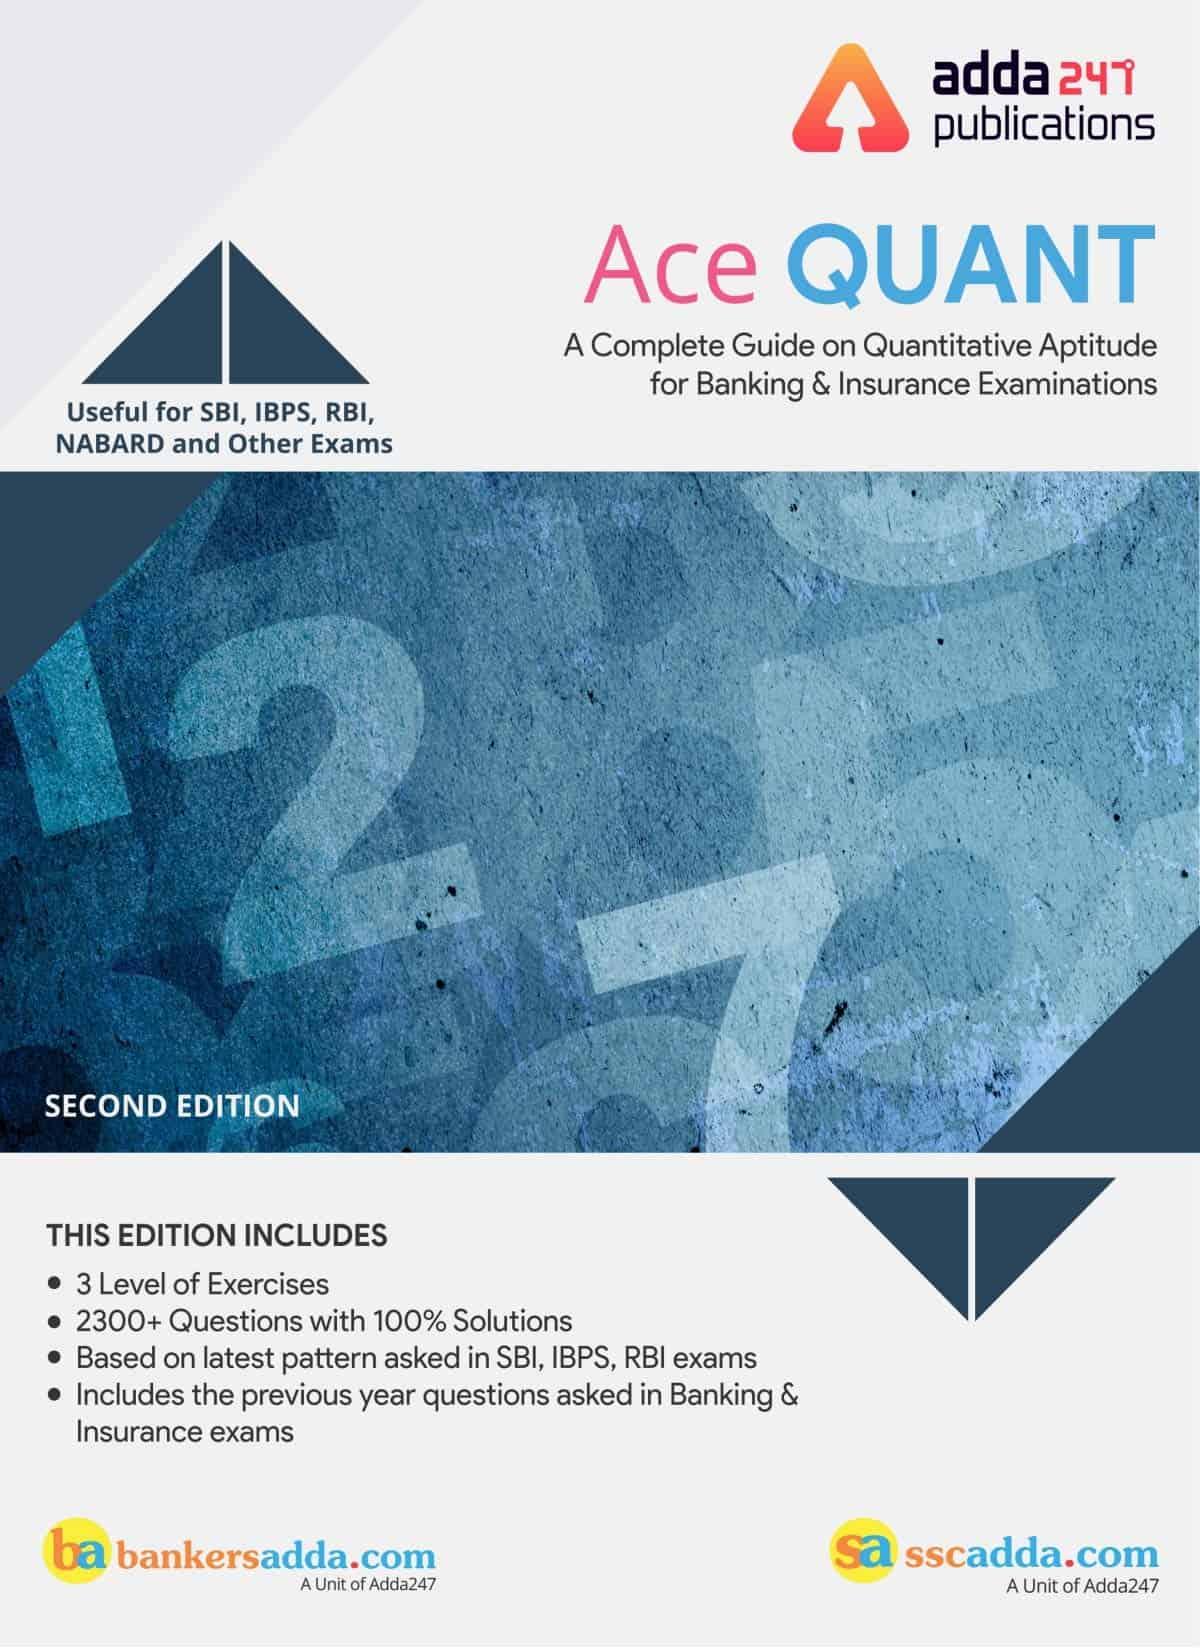 Adda247 Ace Quant Paid Aptitude Book Download PDF for All ...